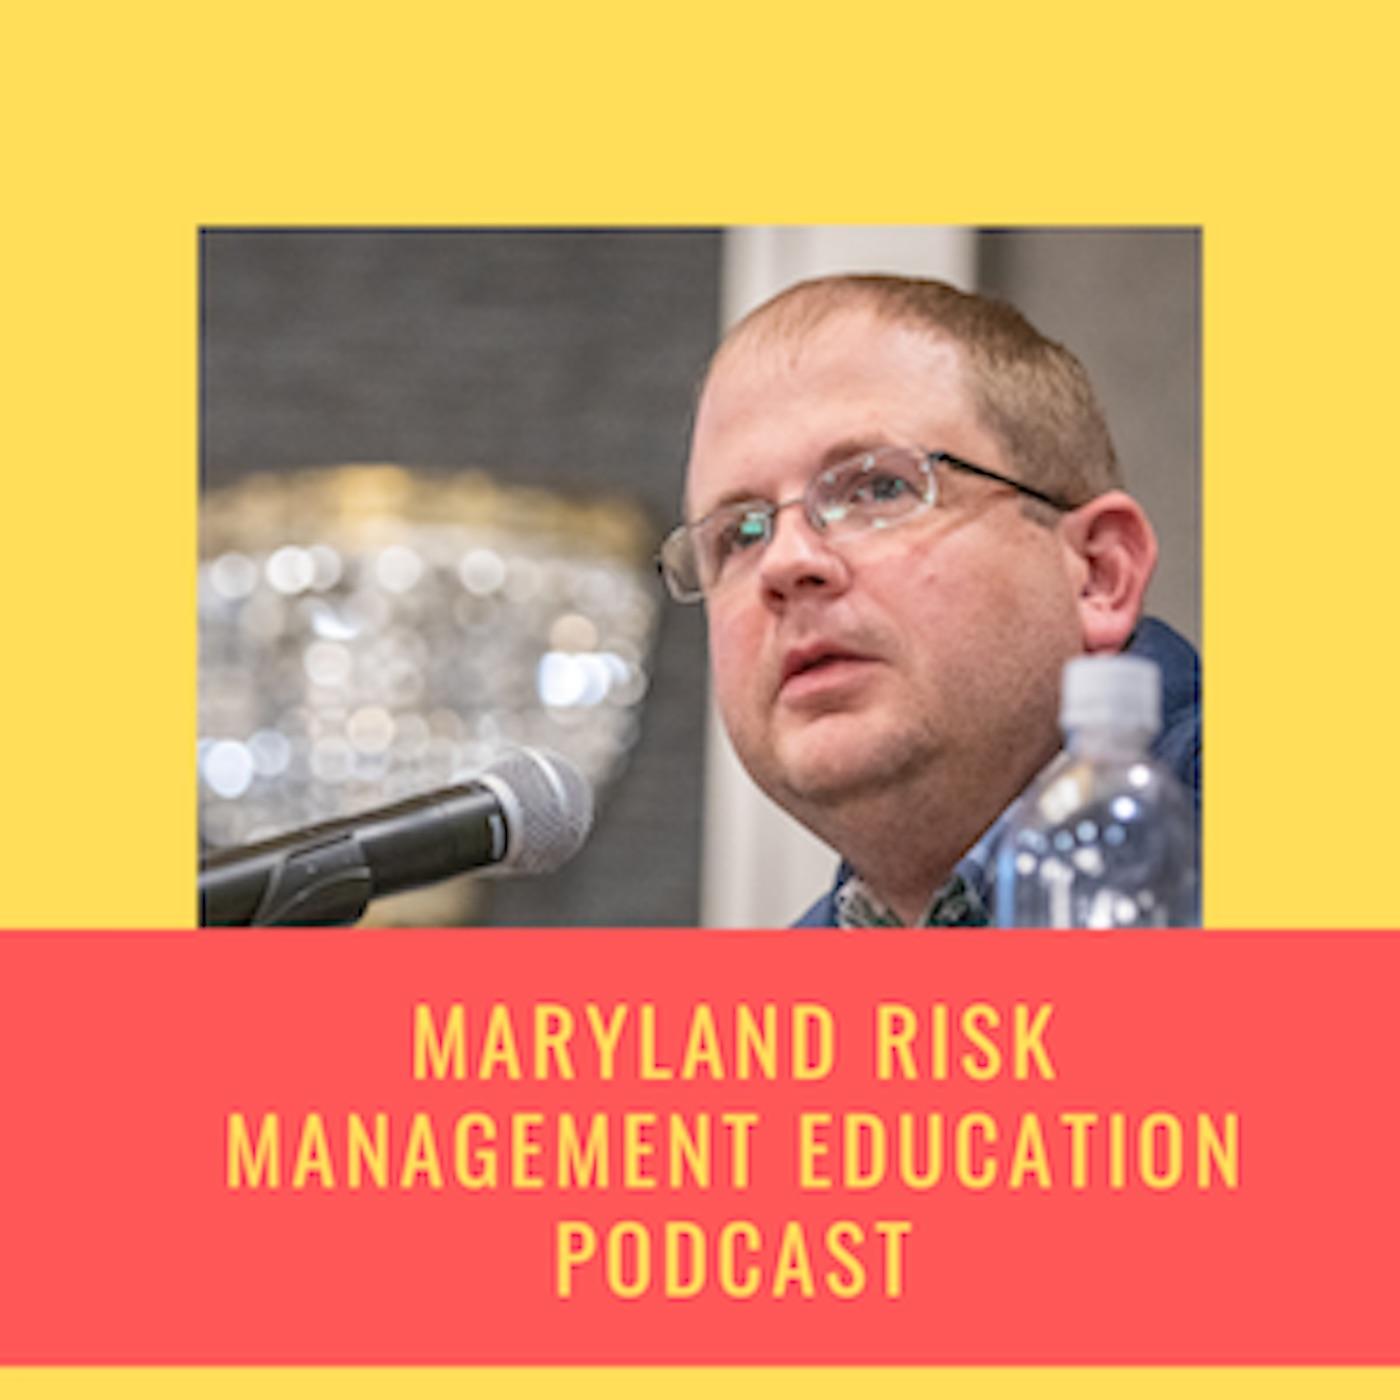 Maryland Risk Management Education Podcast show art